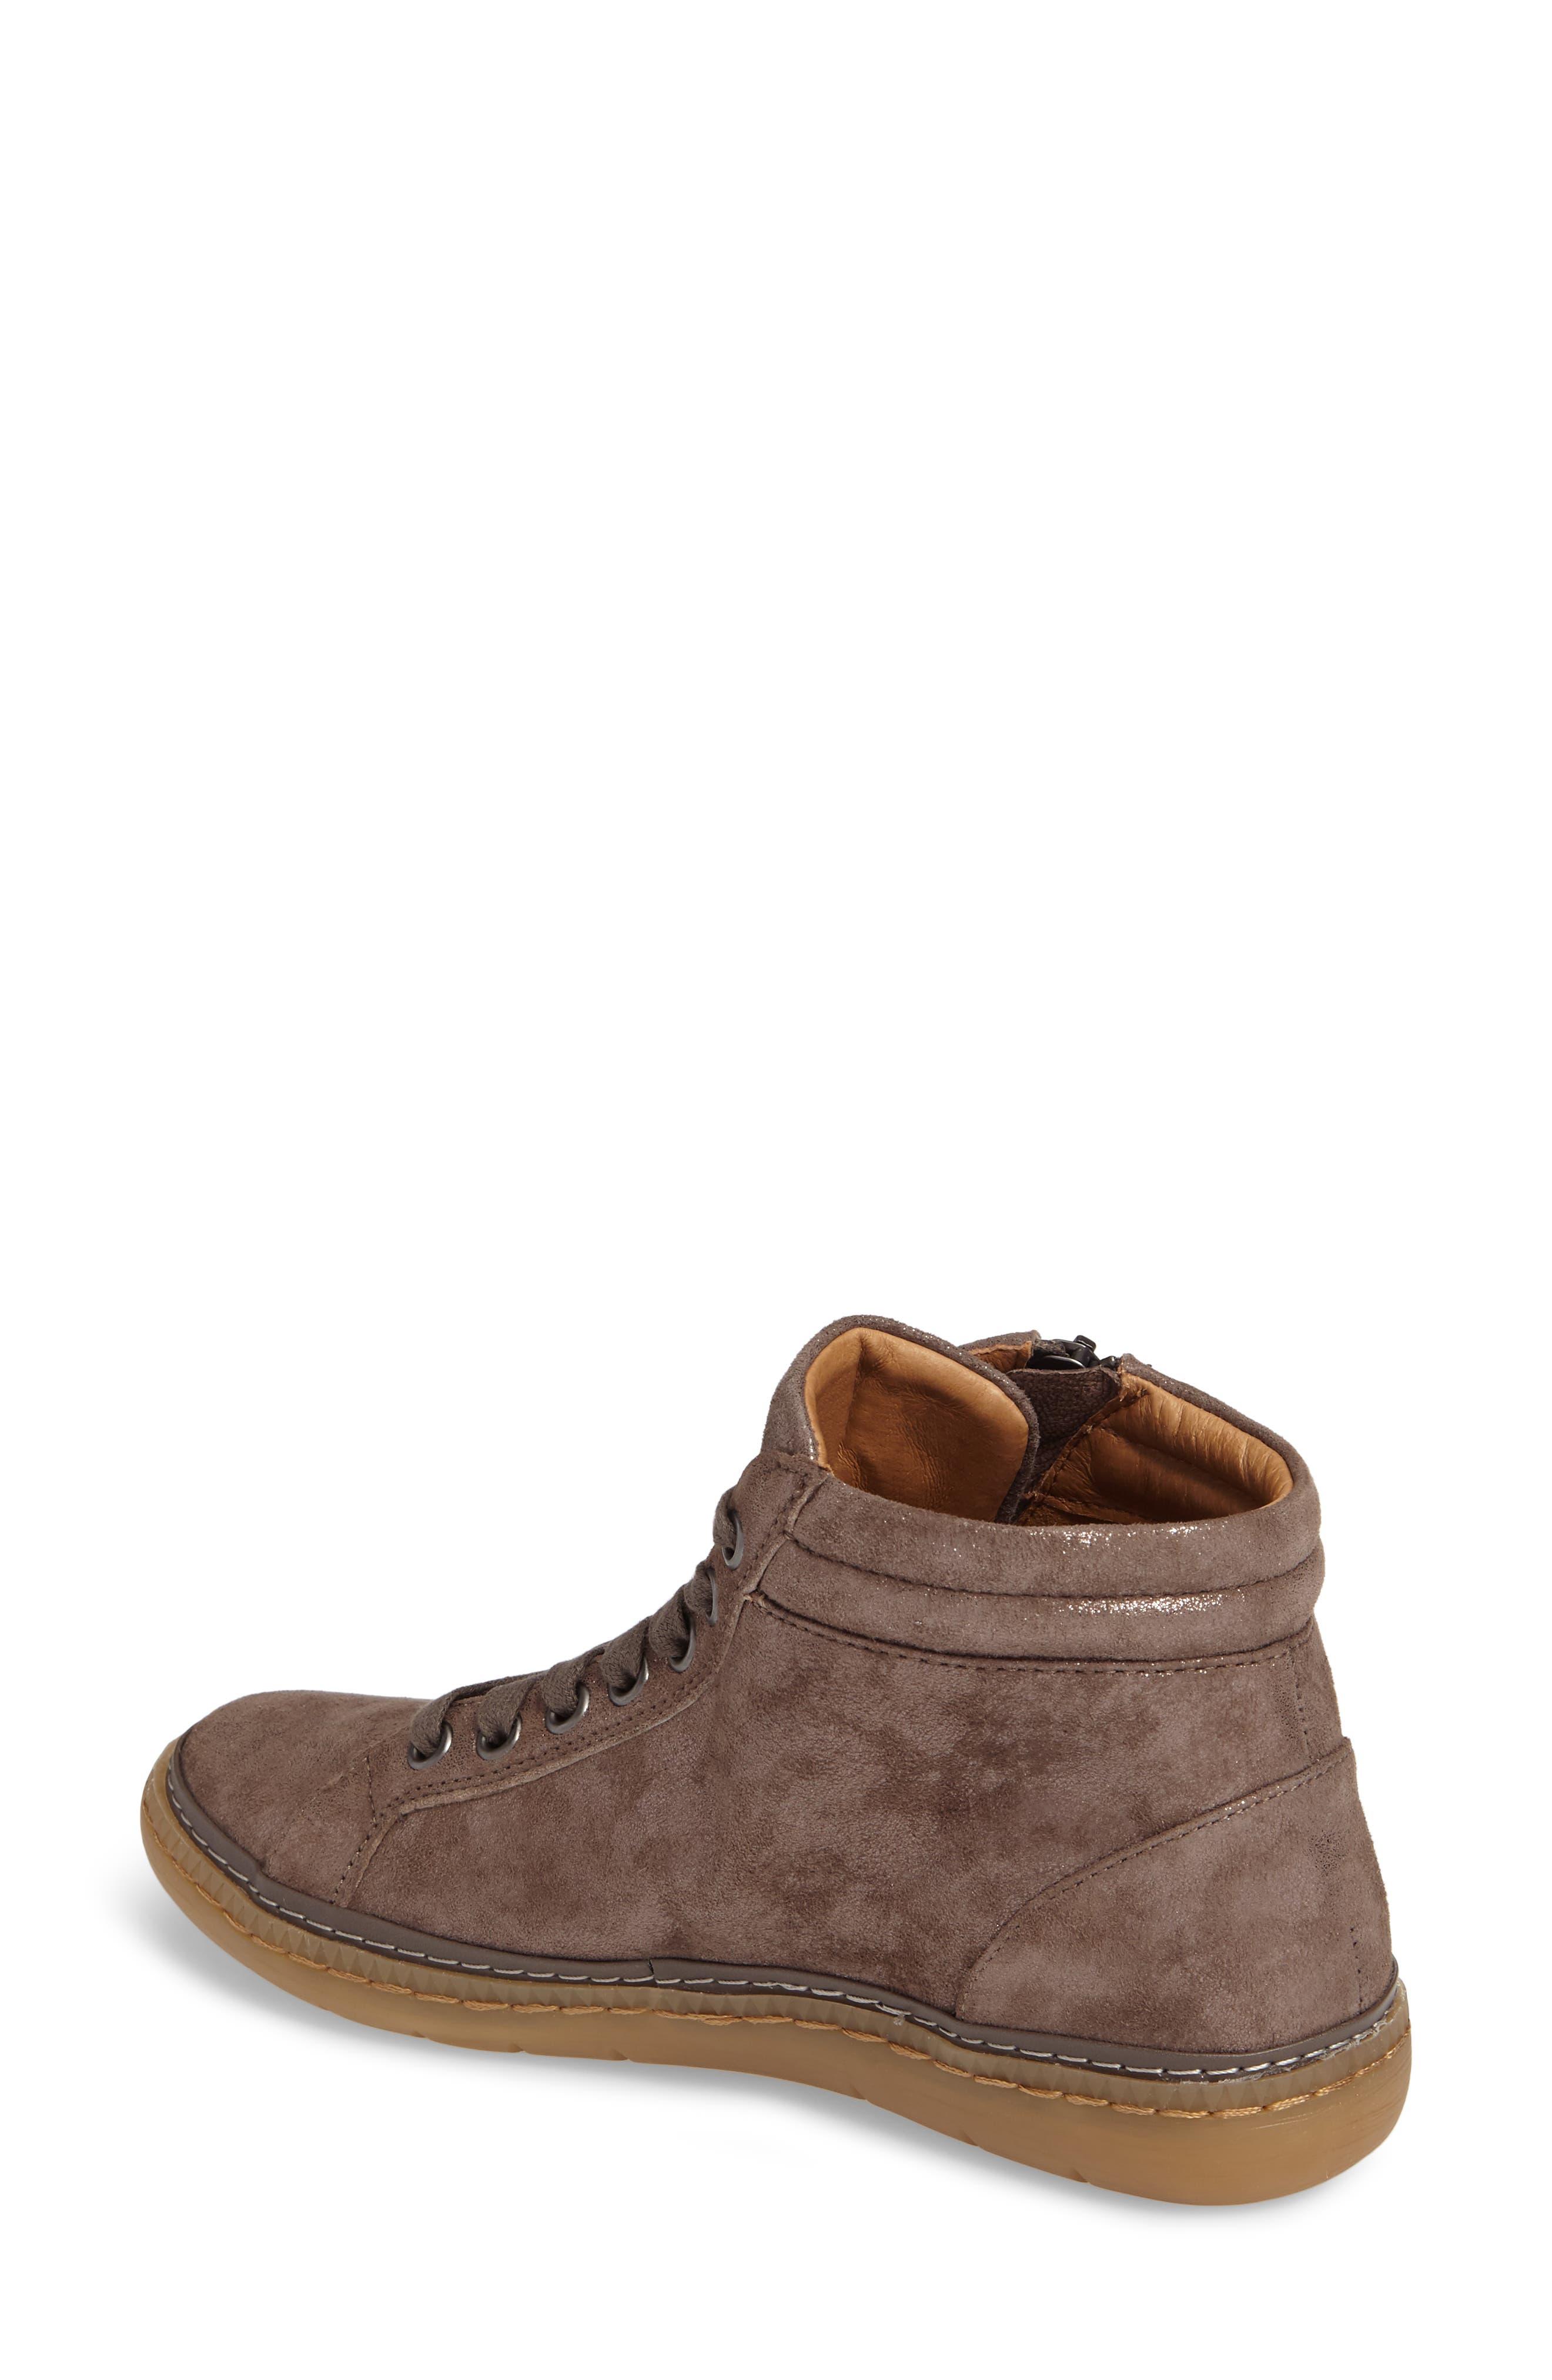 SÖFFT, Annaleigh High Top Sneaker, Alternate thumbnail 2, color, SMOKE FOIL SUEDE